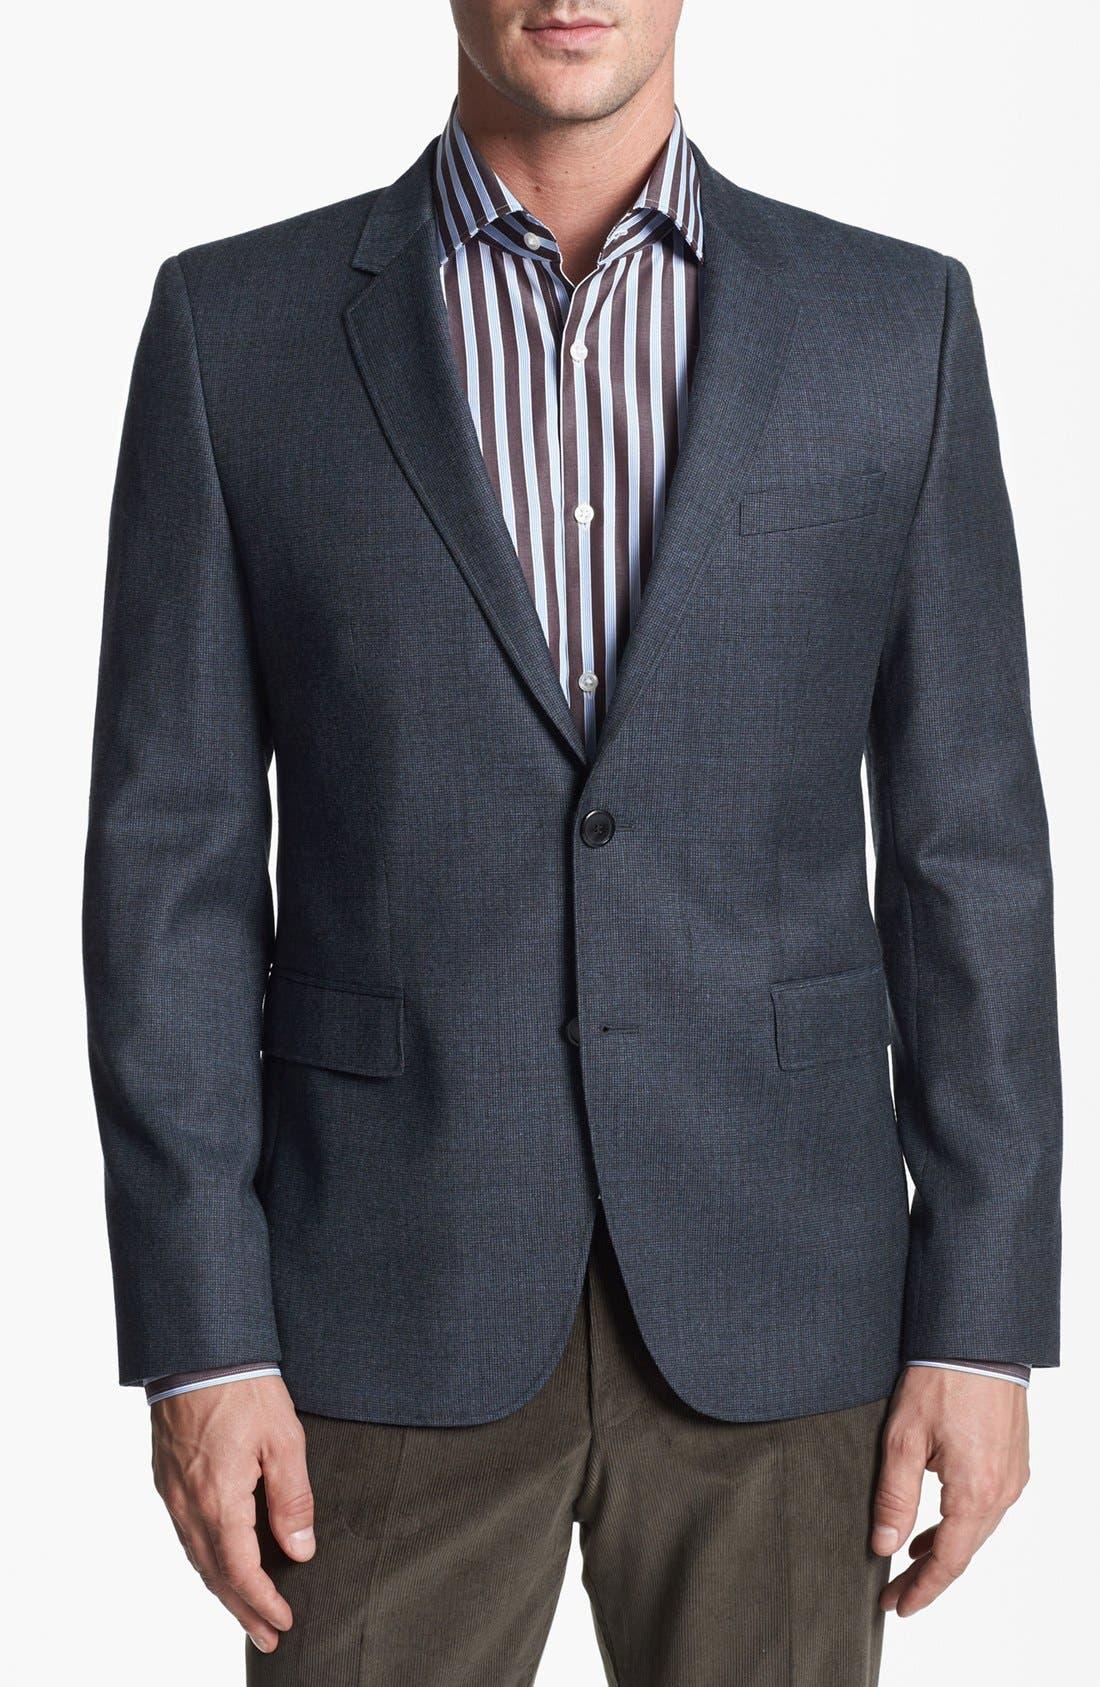 Alternate Image 1 Selected - HUGO 'Aeris' Extra Trim Fit Sportcoat